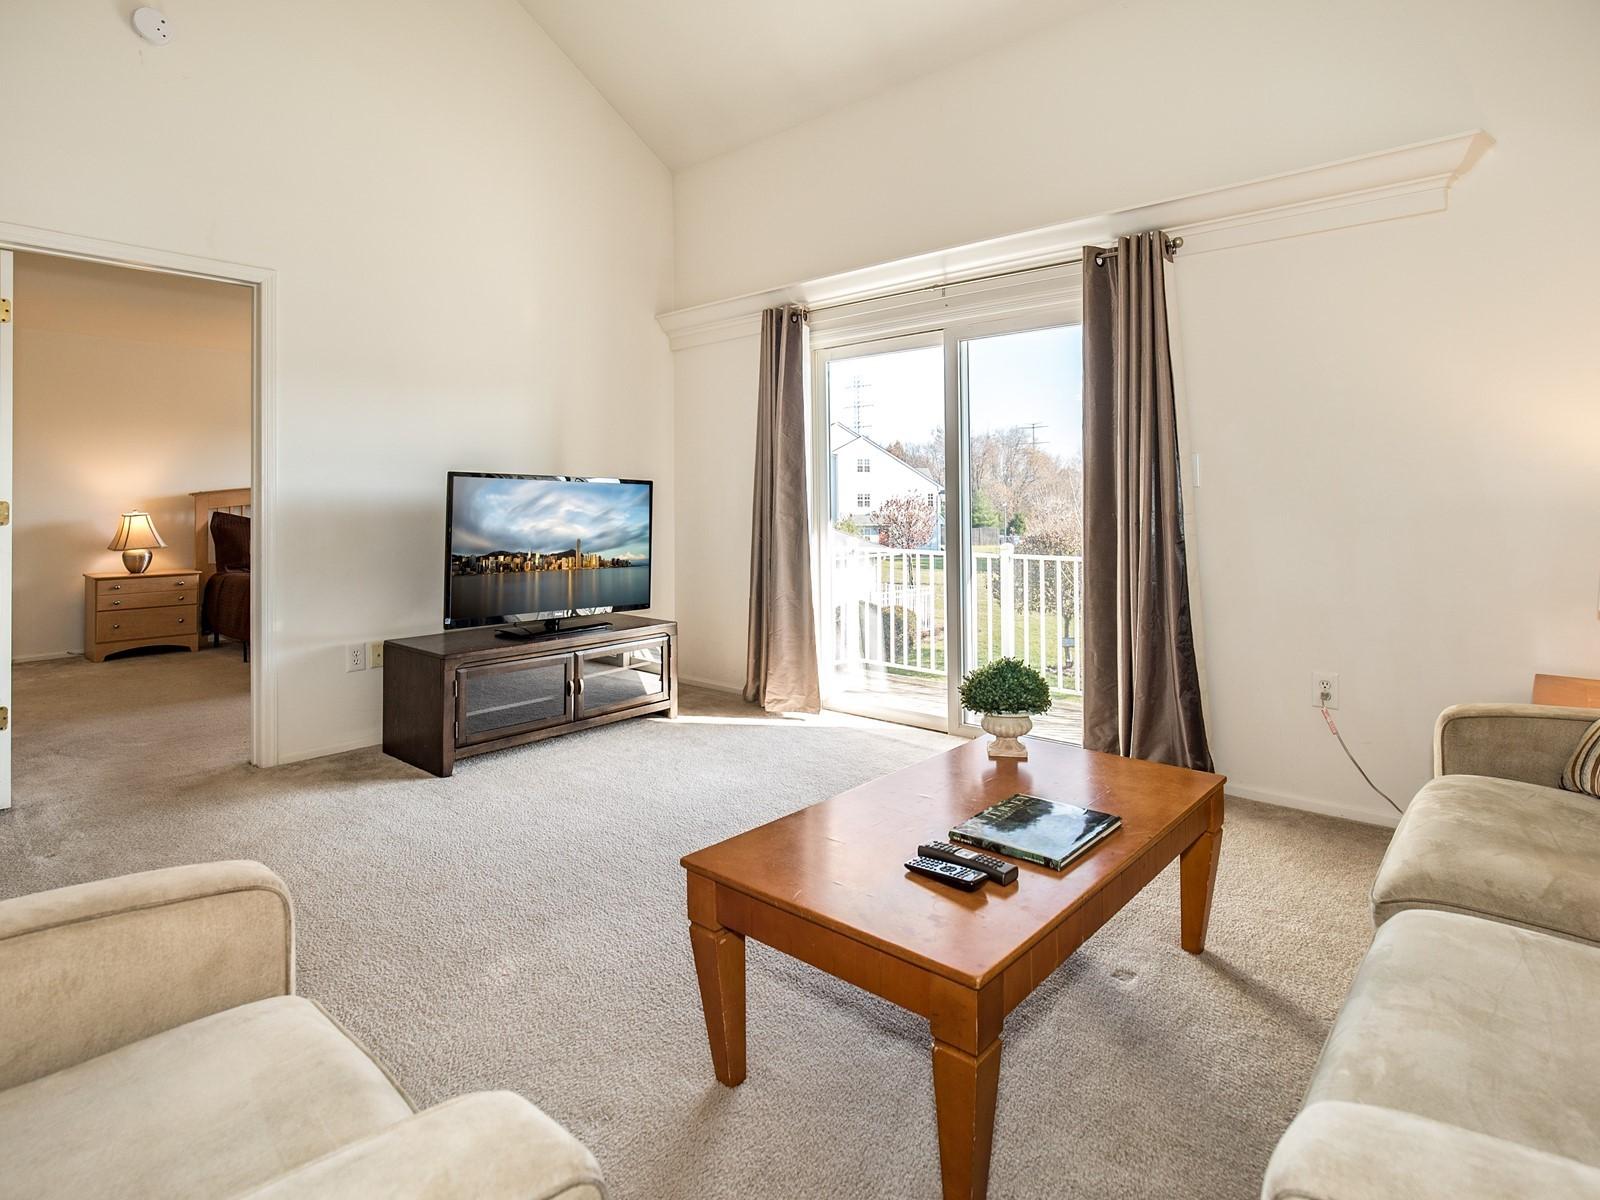 02_Woodbridge-Furnished-Rental-1409_LivingRoom